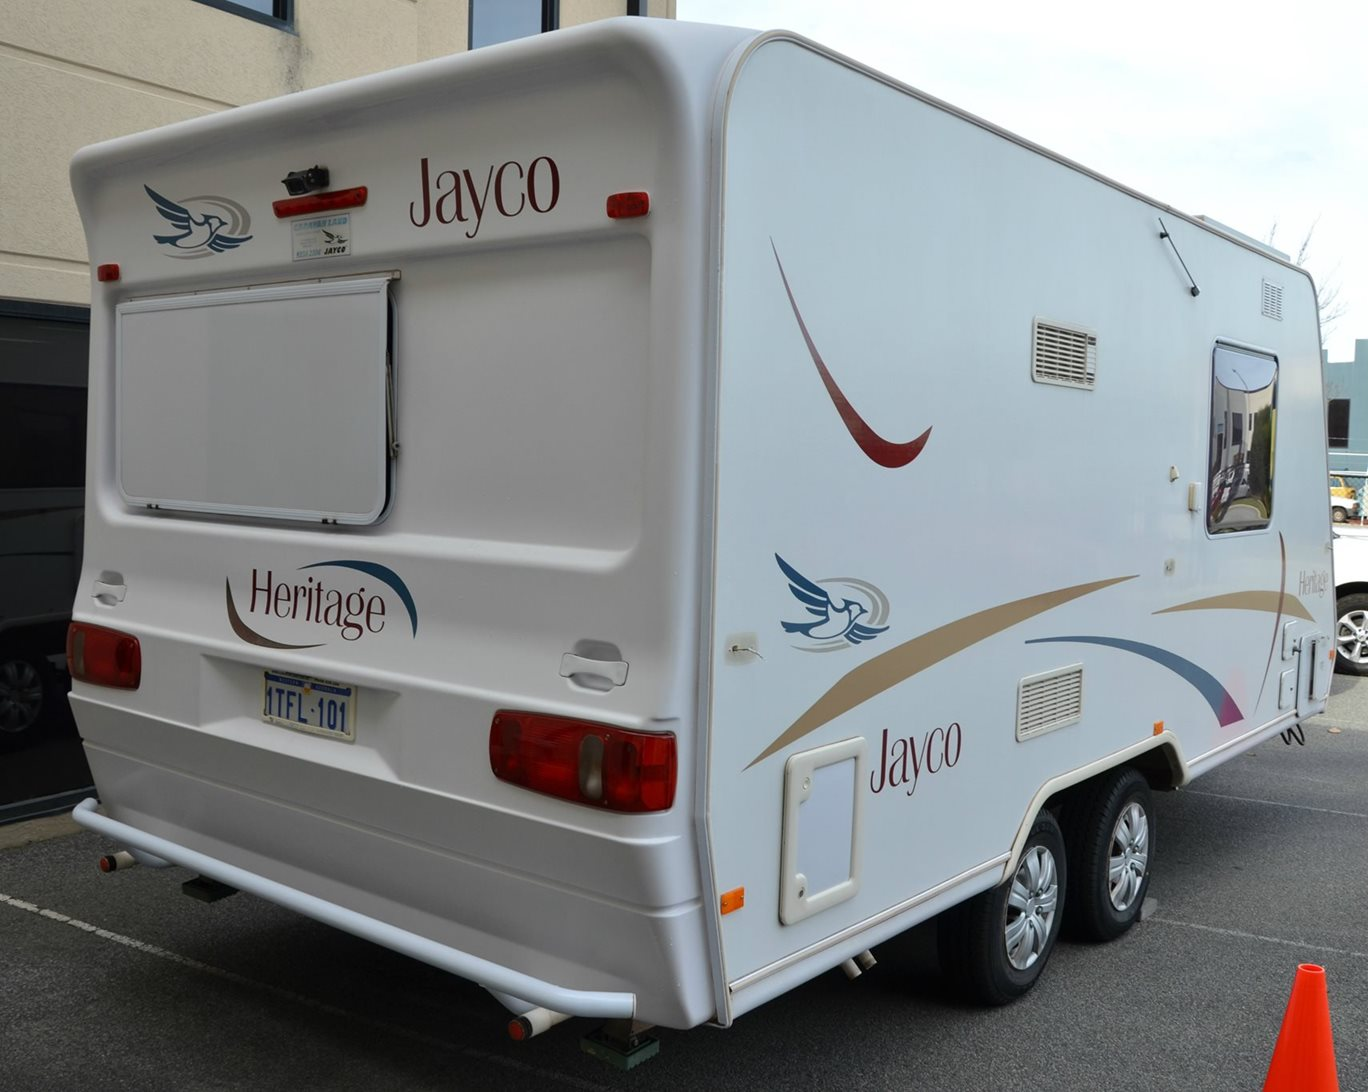 Dull & faded Jayco Heritage caravan